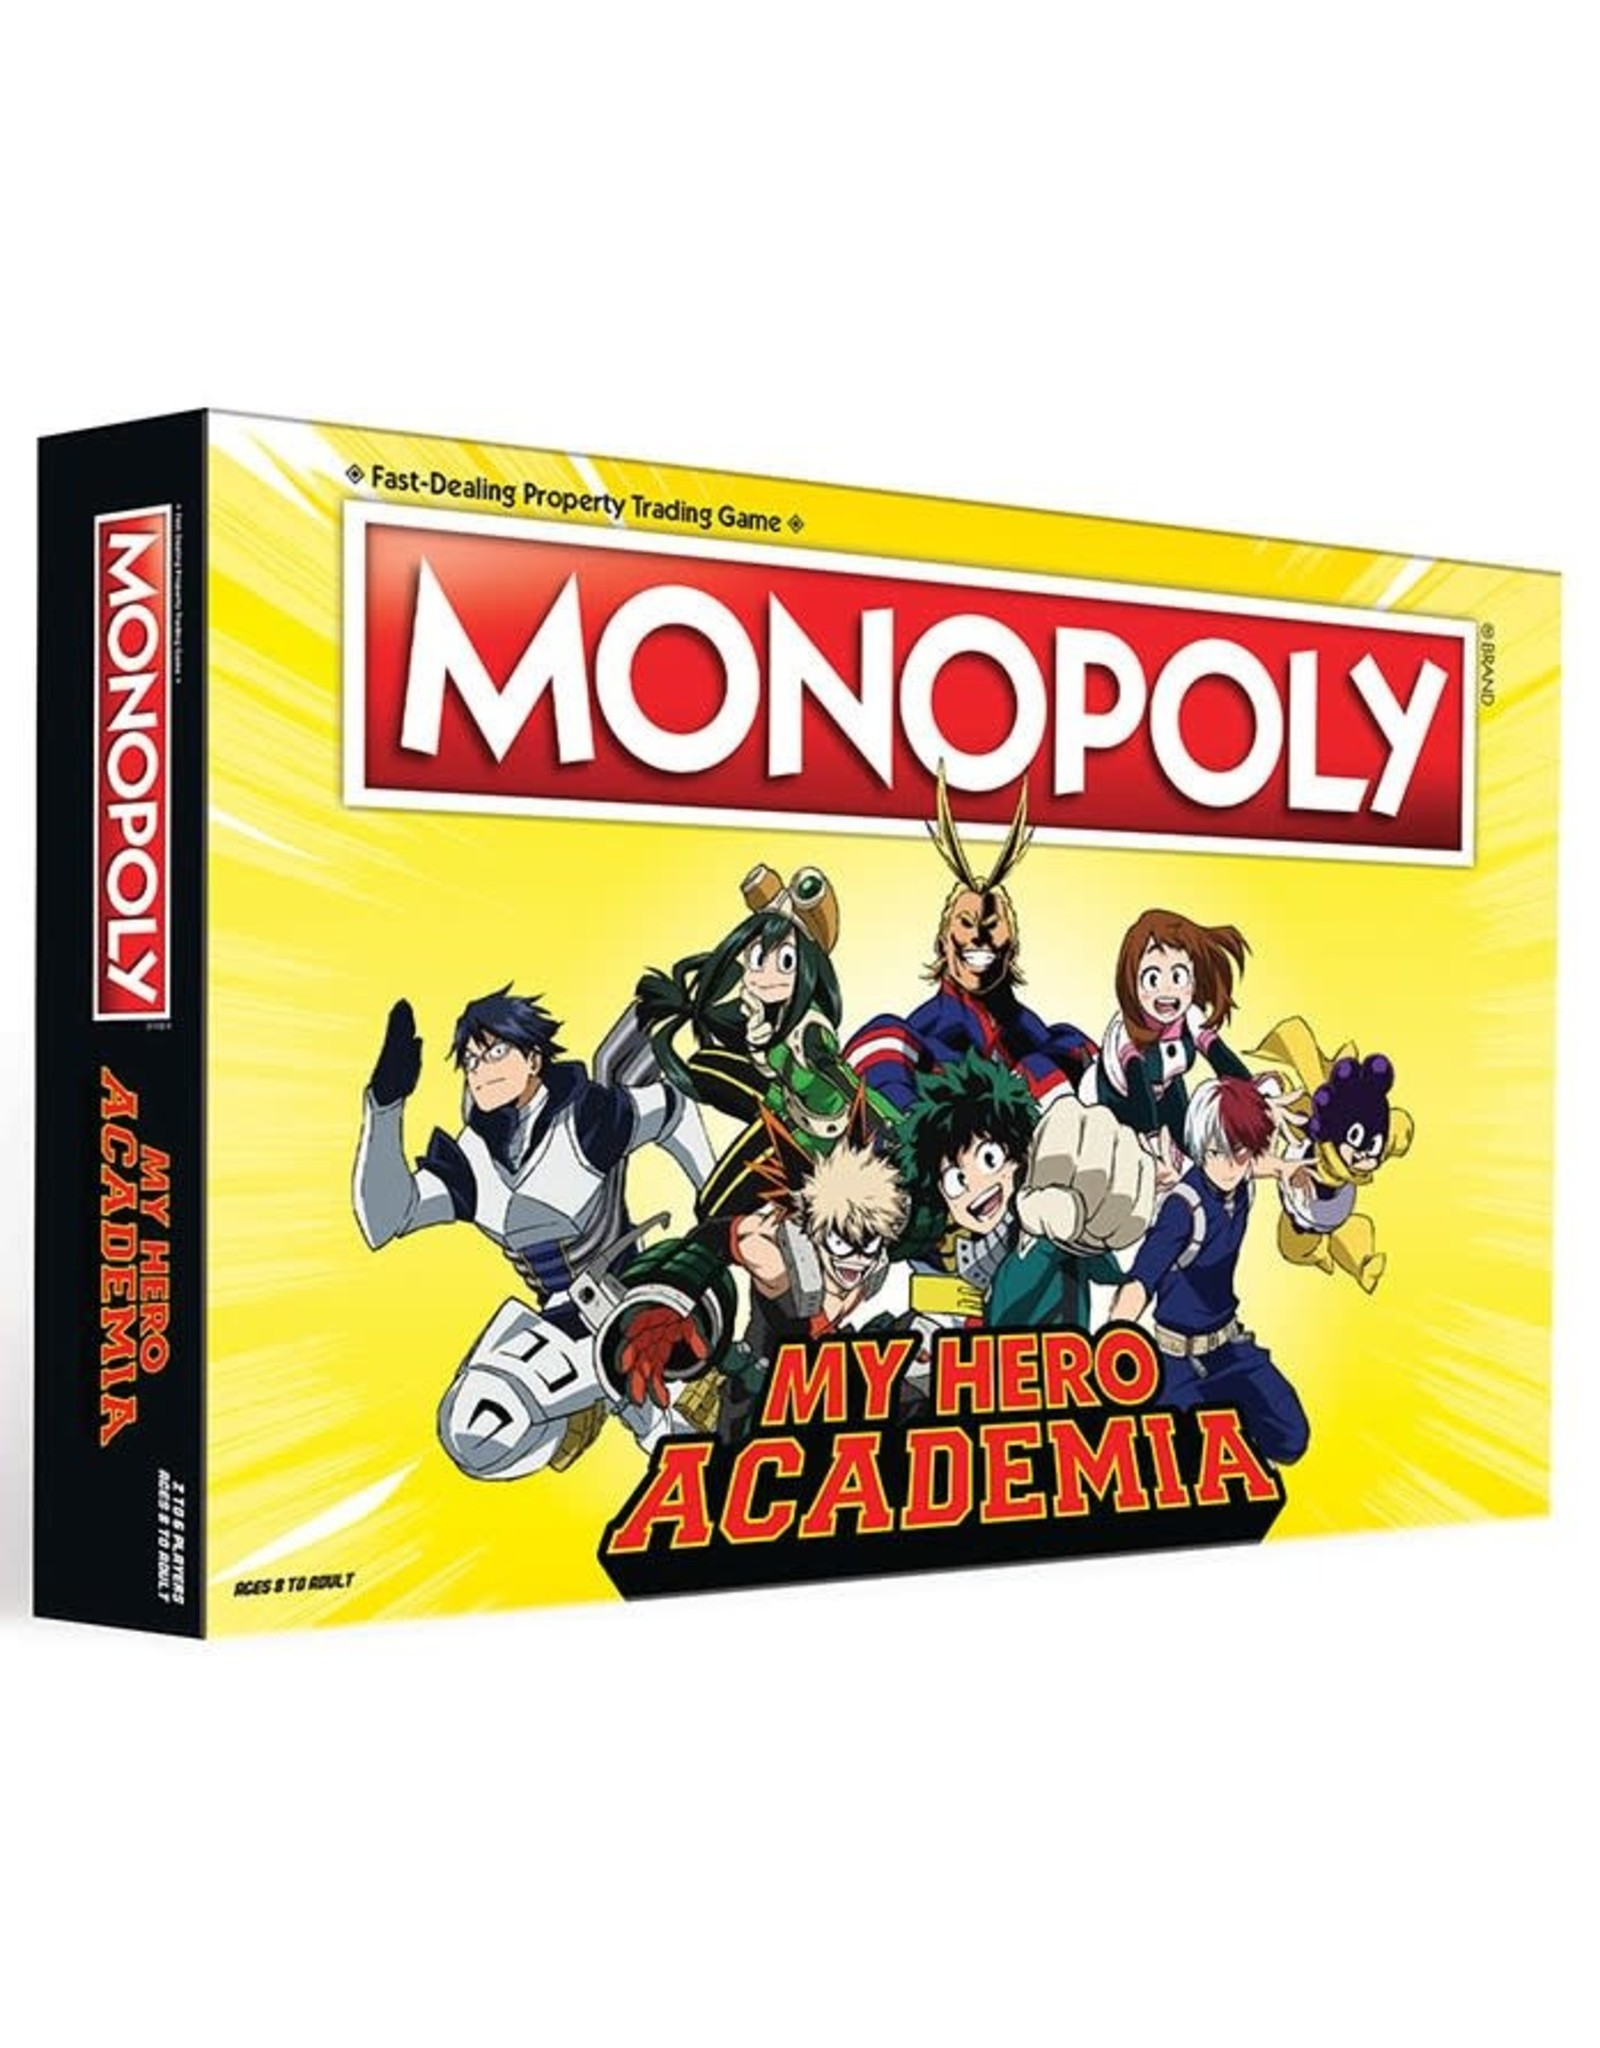 USAopoly Monopoly: My Hero Academia